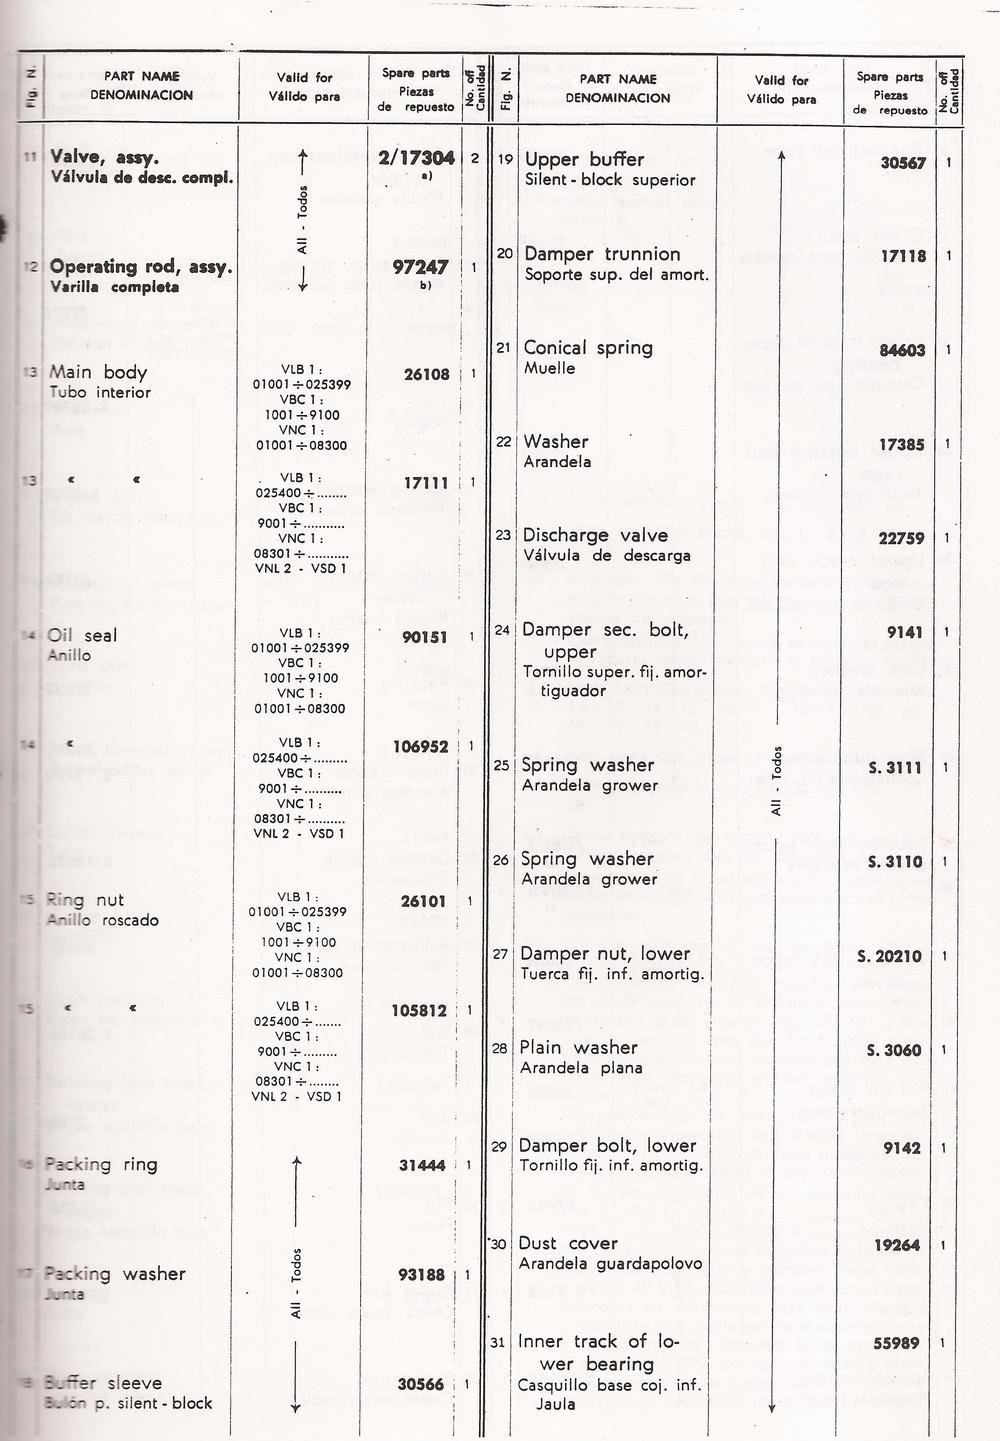 02-25-2013 vespa manaul 49.jpg